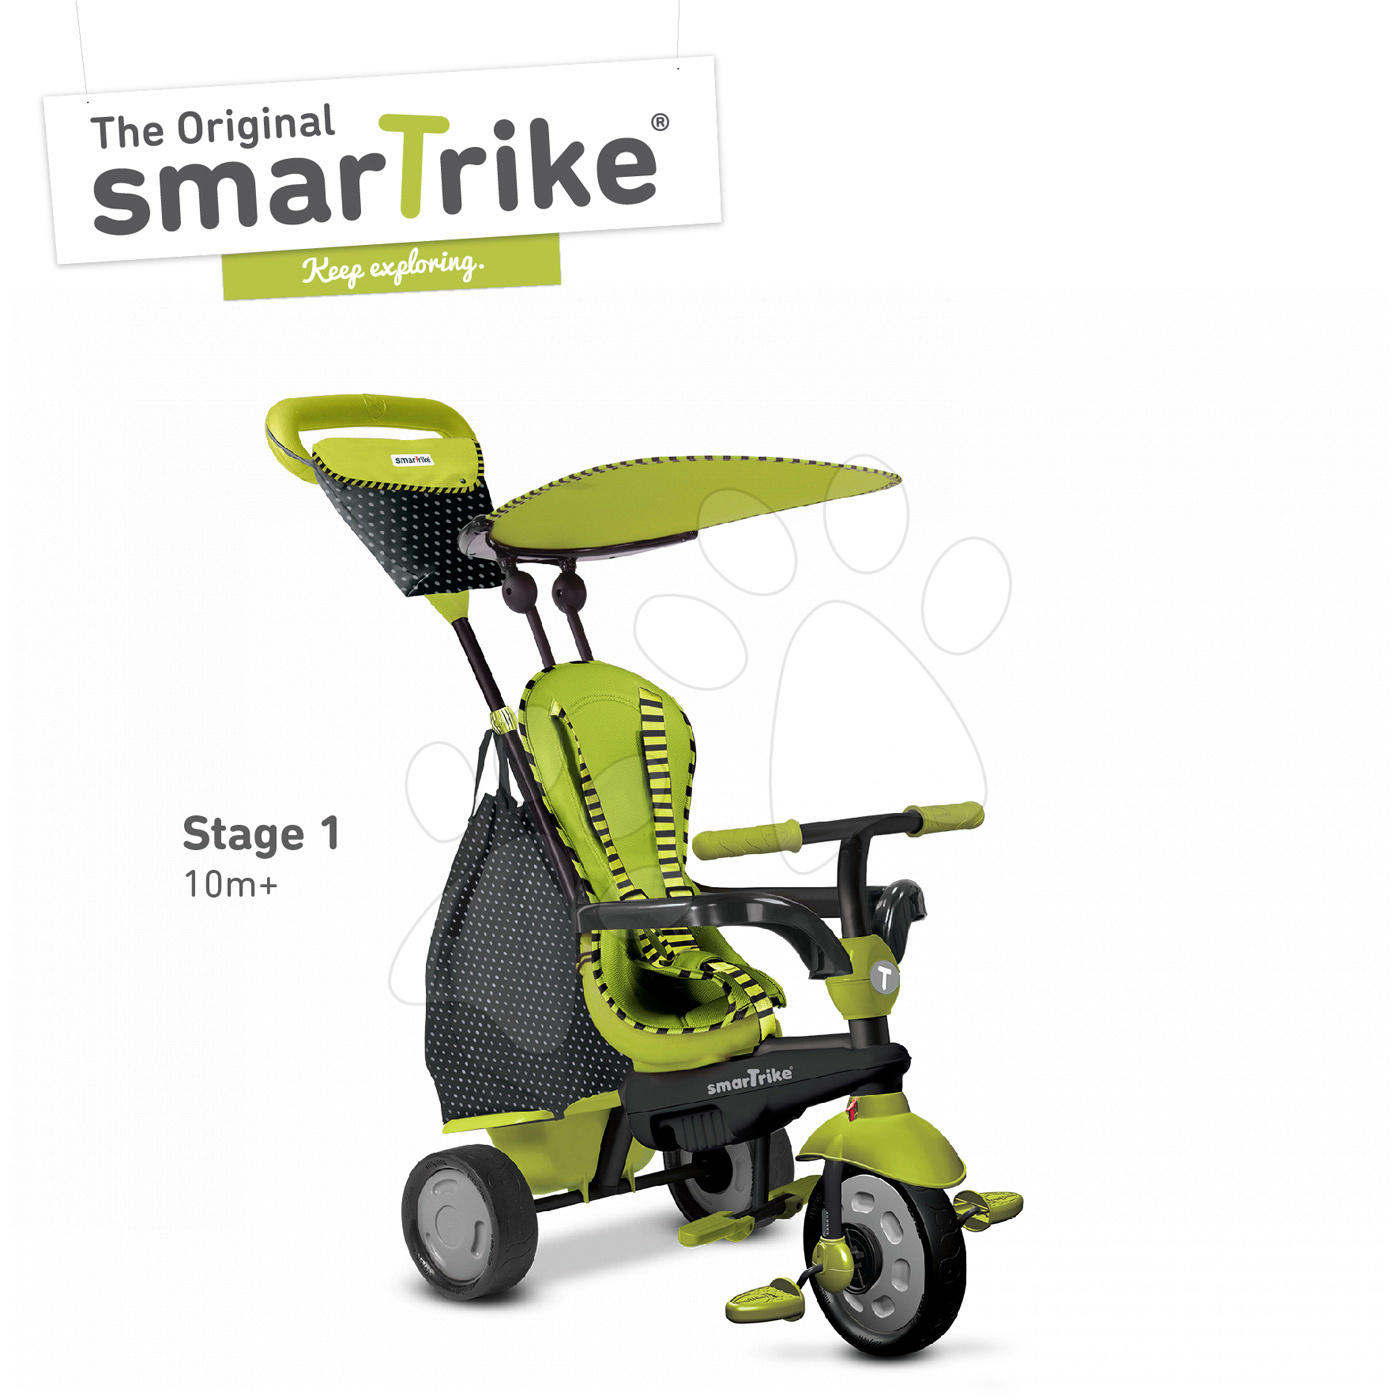 Trojkolky od 10 mesiacov - Trojkolka Glow Touch Steering 4v1 Black&Green smarTrike zeleno-čierna od 10 mes